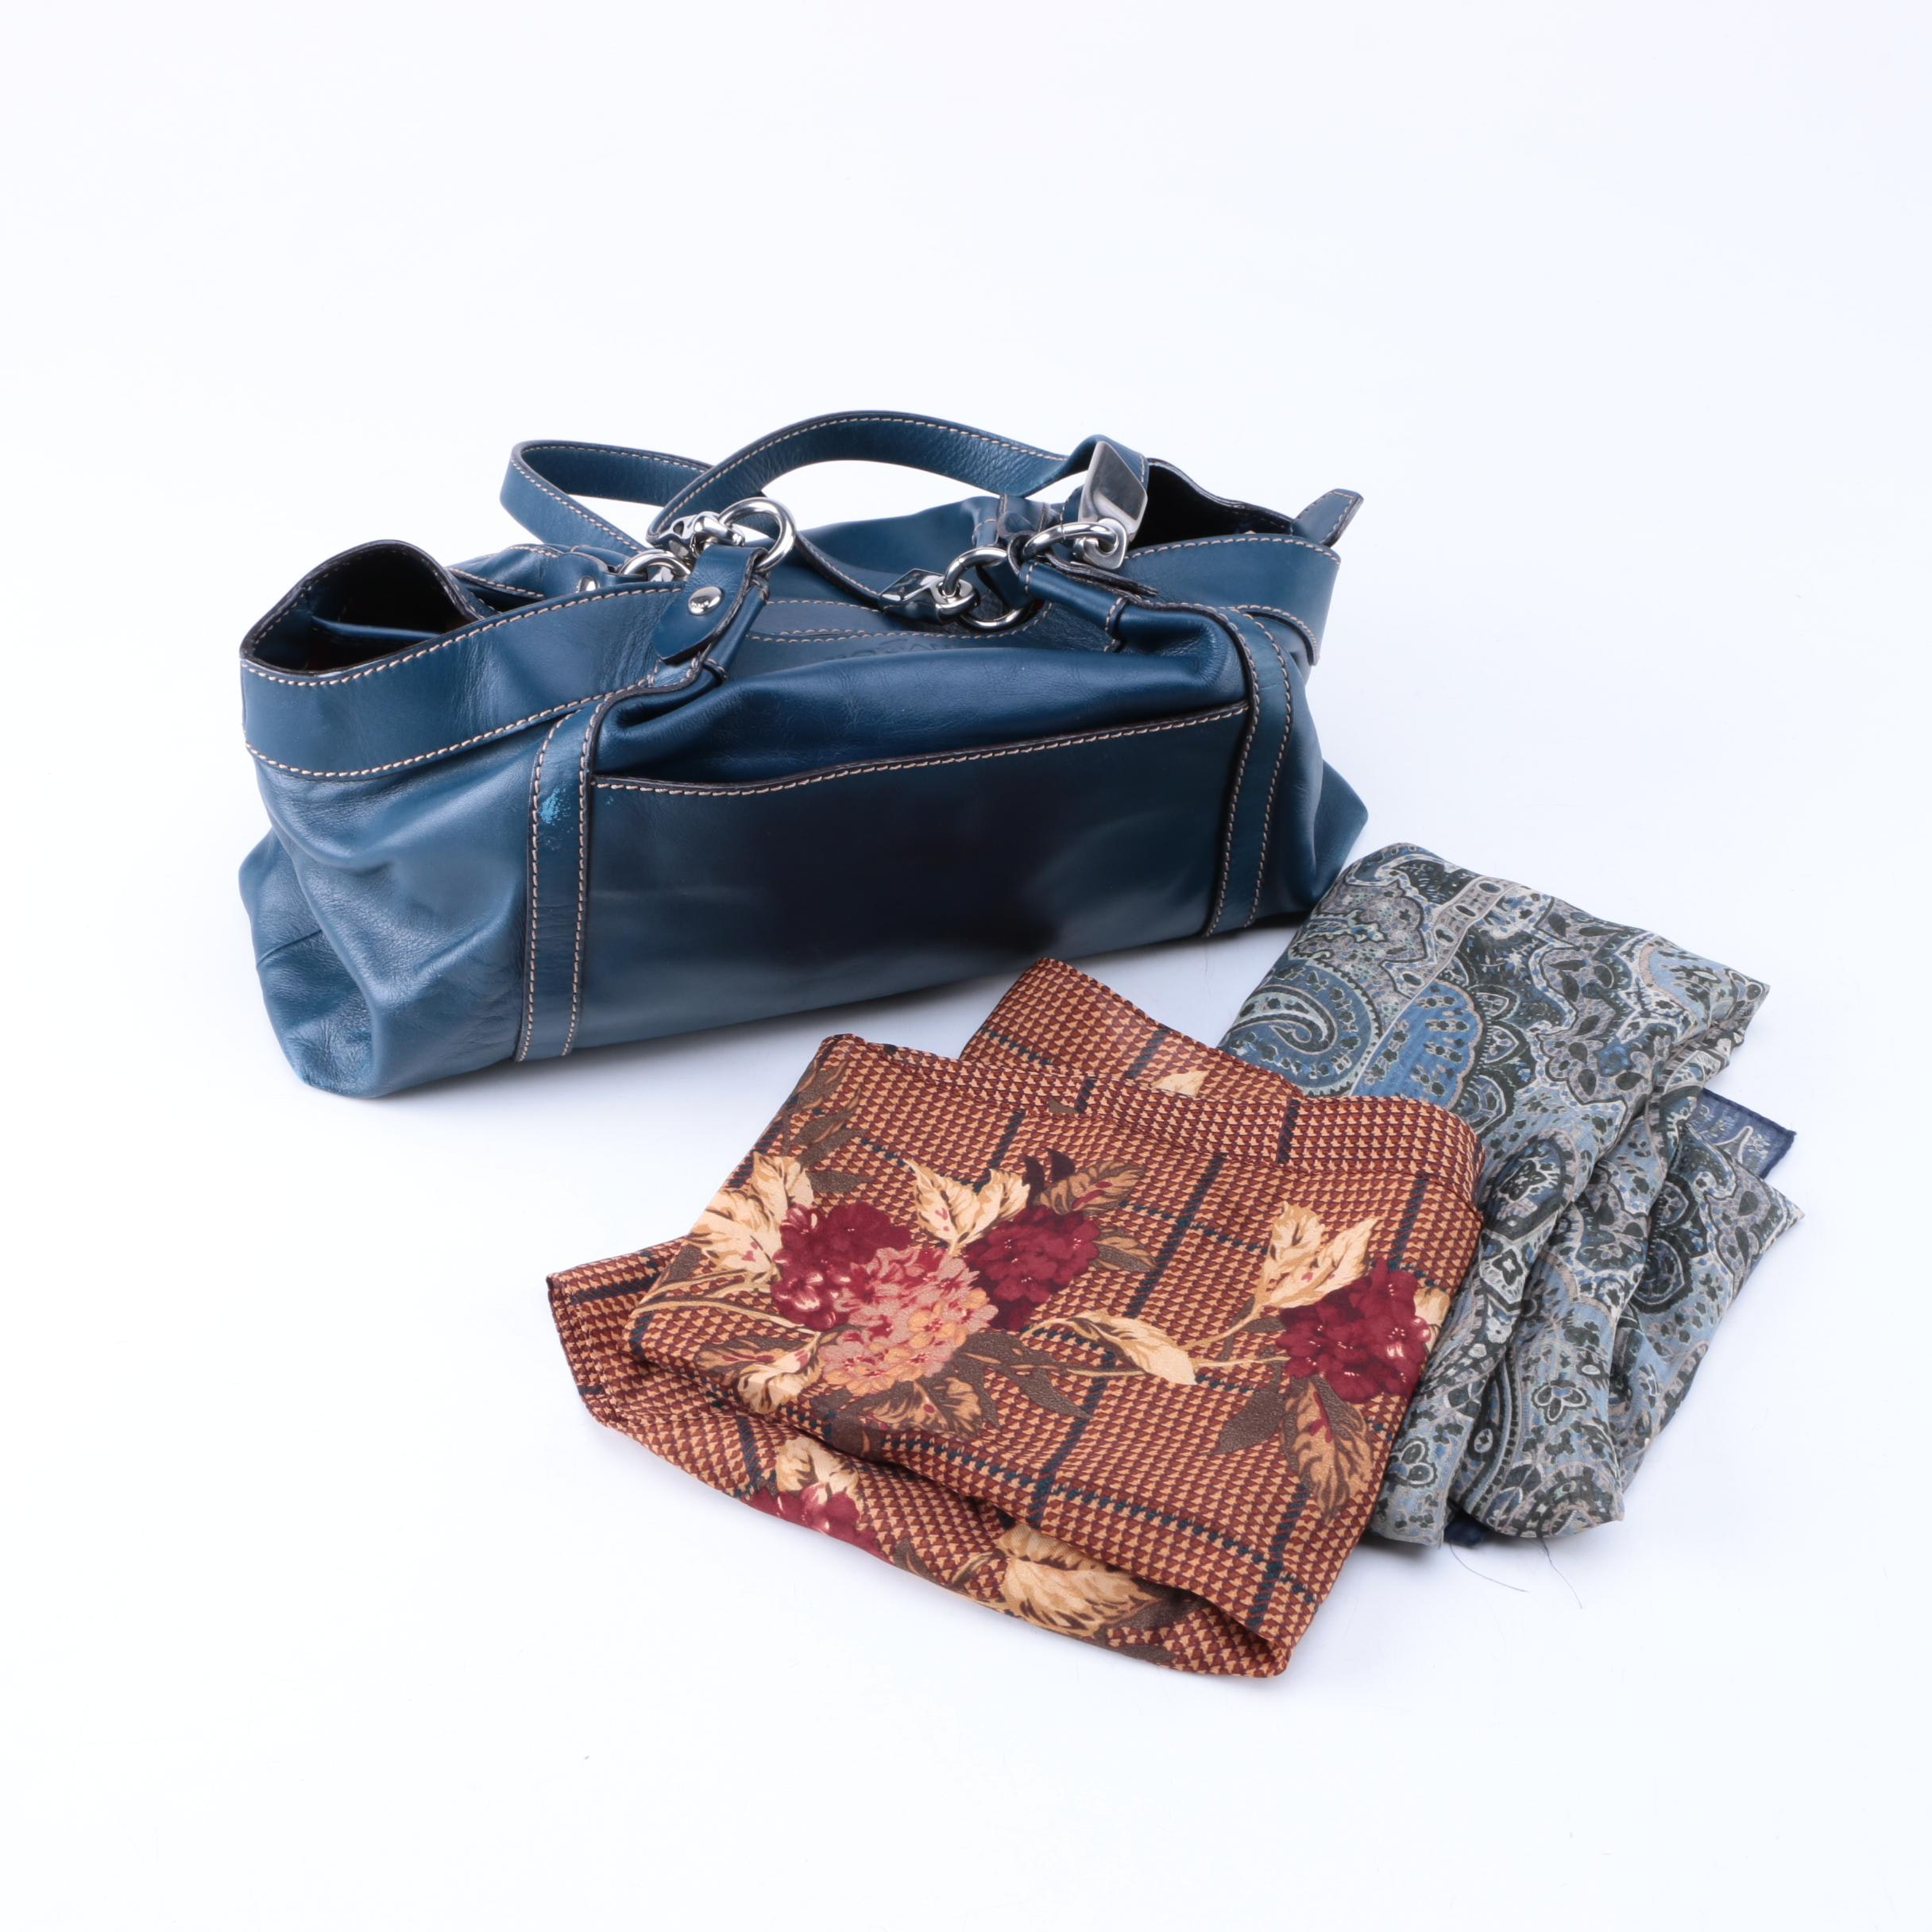 Hogan Handbag with Printed Ralph Lauren Scarves